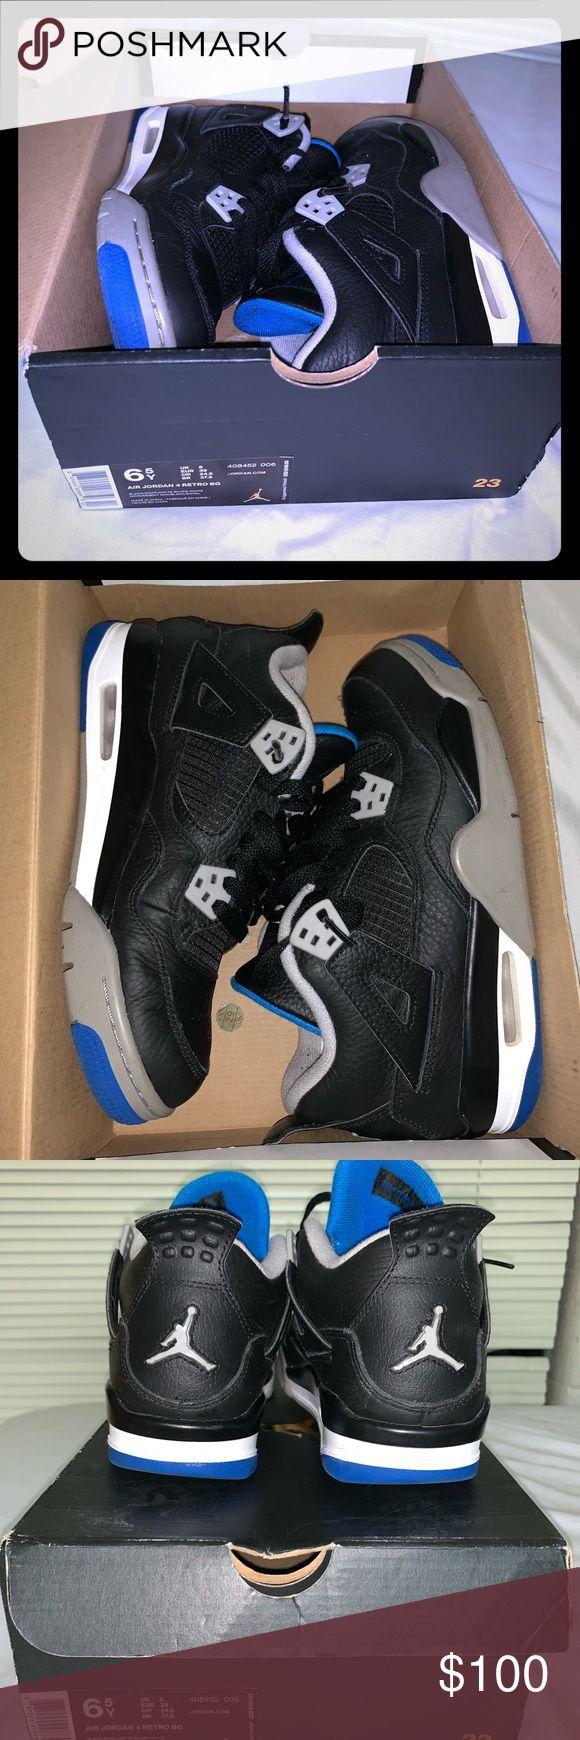 "Size 6.5 GS Air Jordan 4 ""Motorsport Alternate"" Air"